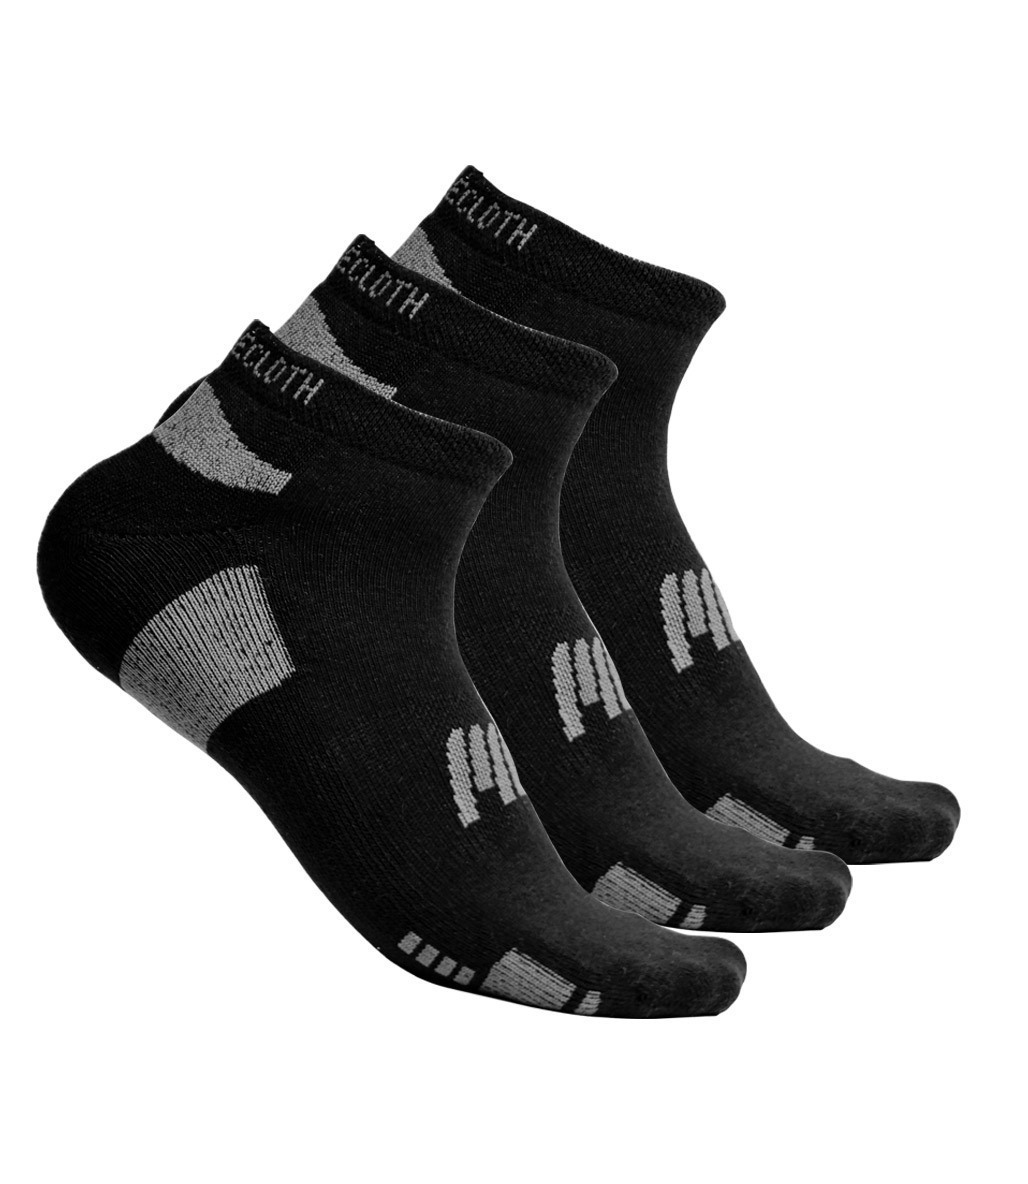 MuscleCloth Stay Fresh Çorap 3'Lü Paket Siyah